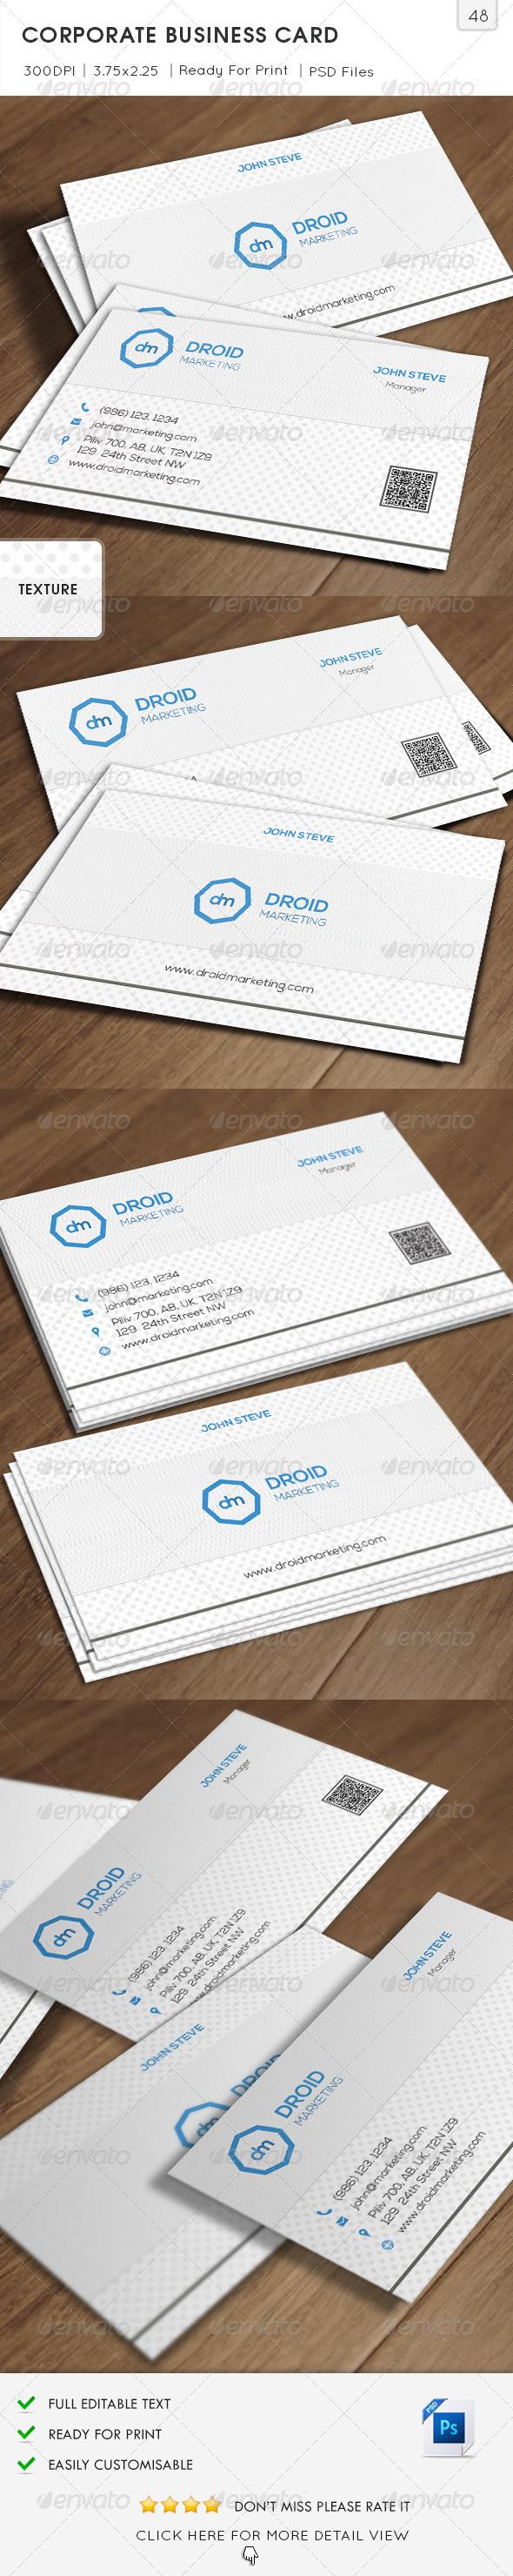 GraphicRiver Marketing Corporate Business Card v48 6665213